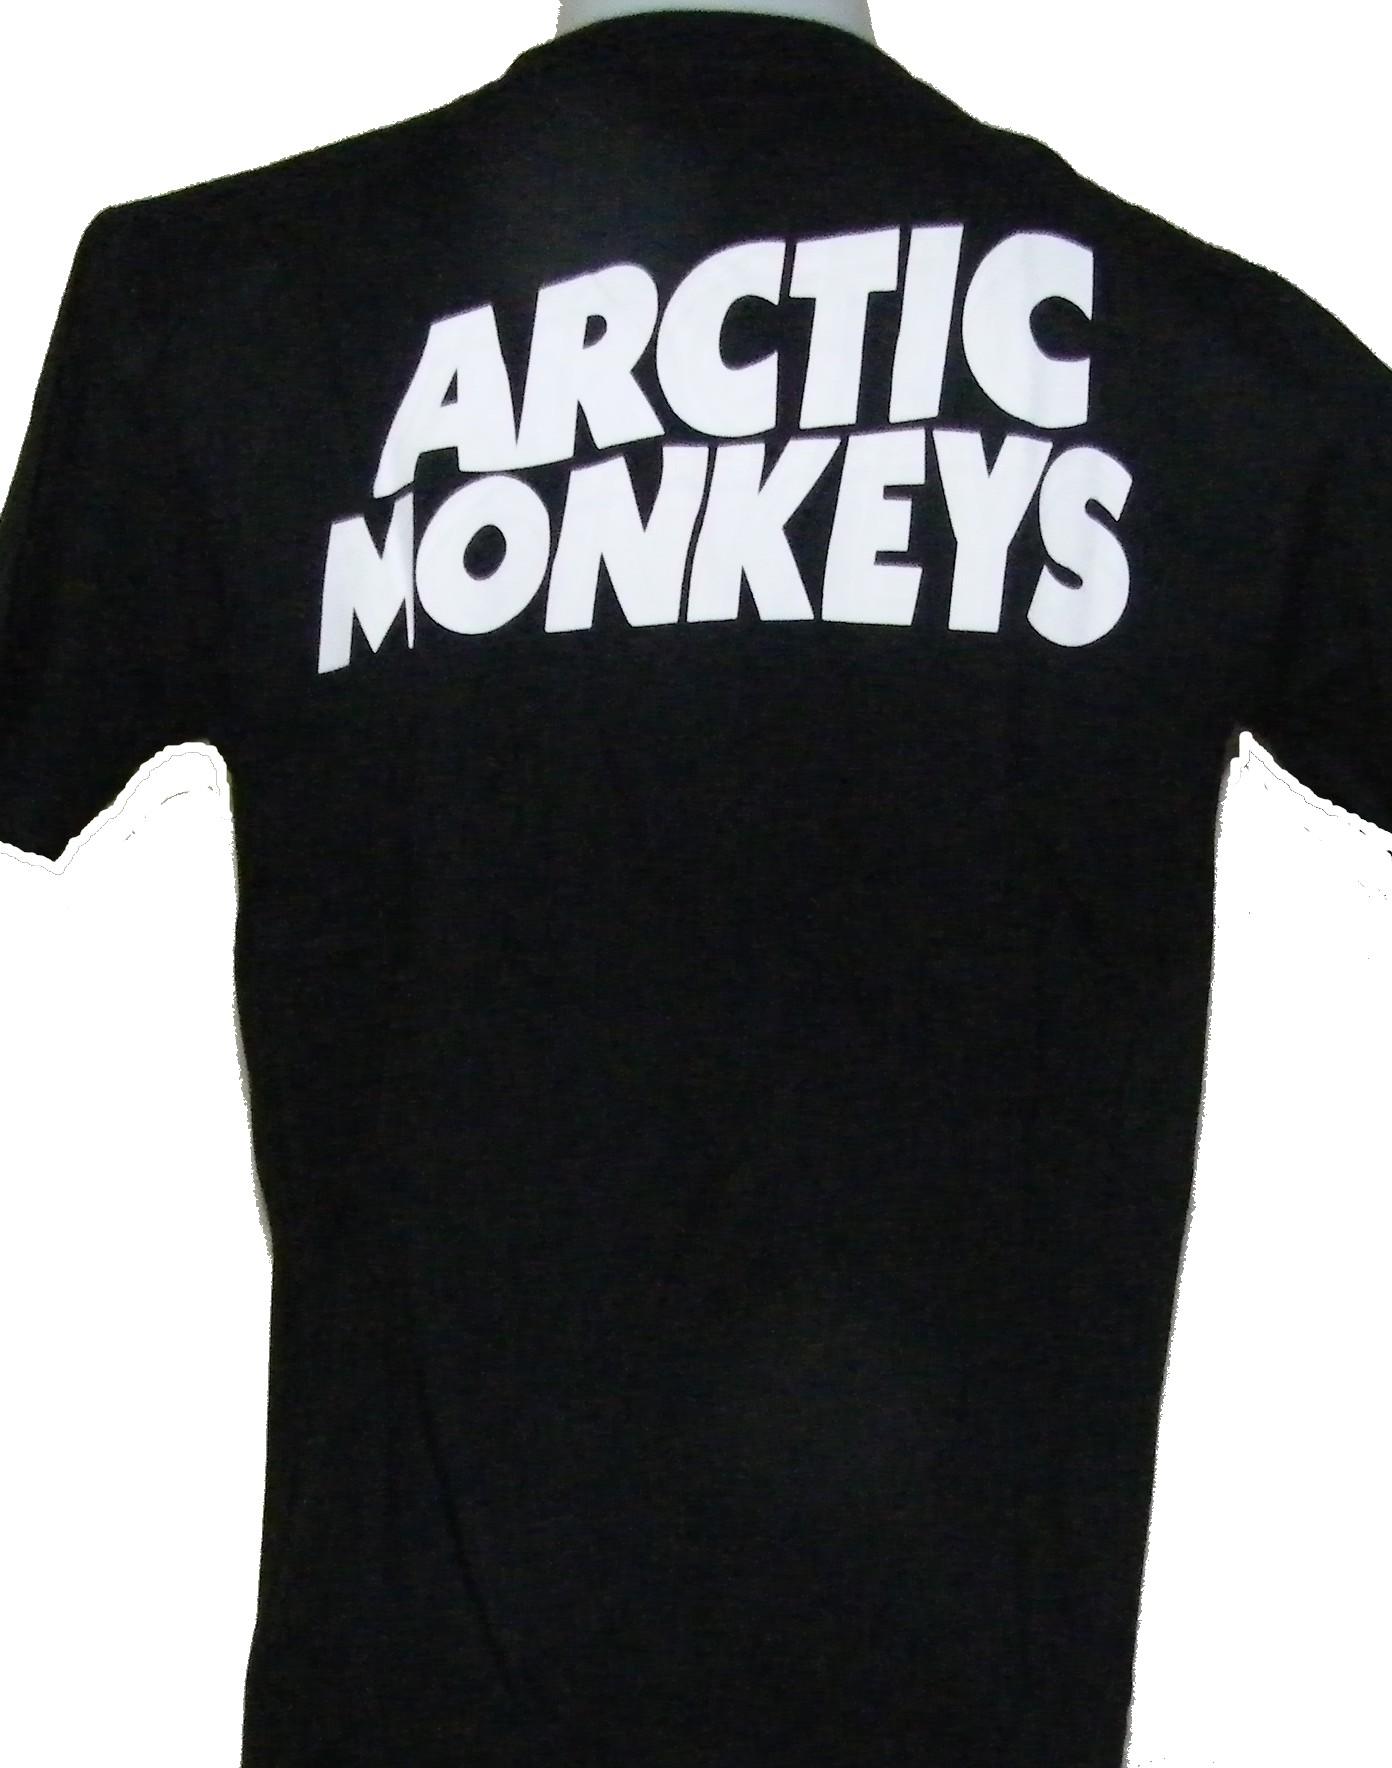 Arctic Monkeys T Shirt Size L Roxxbkk Hoodie